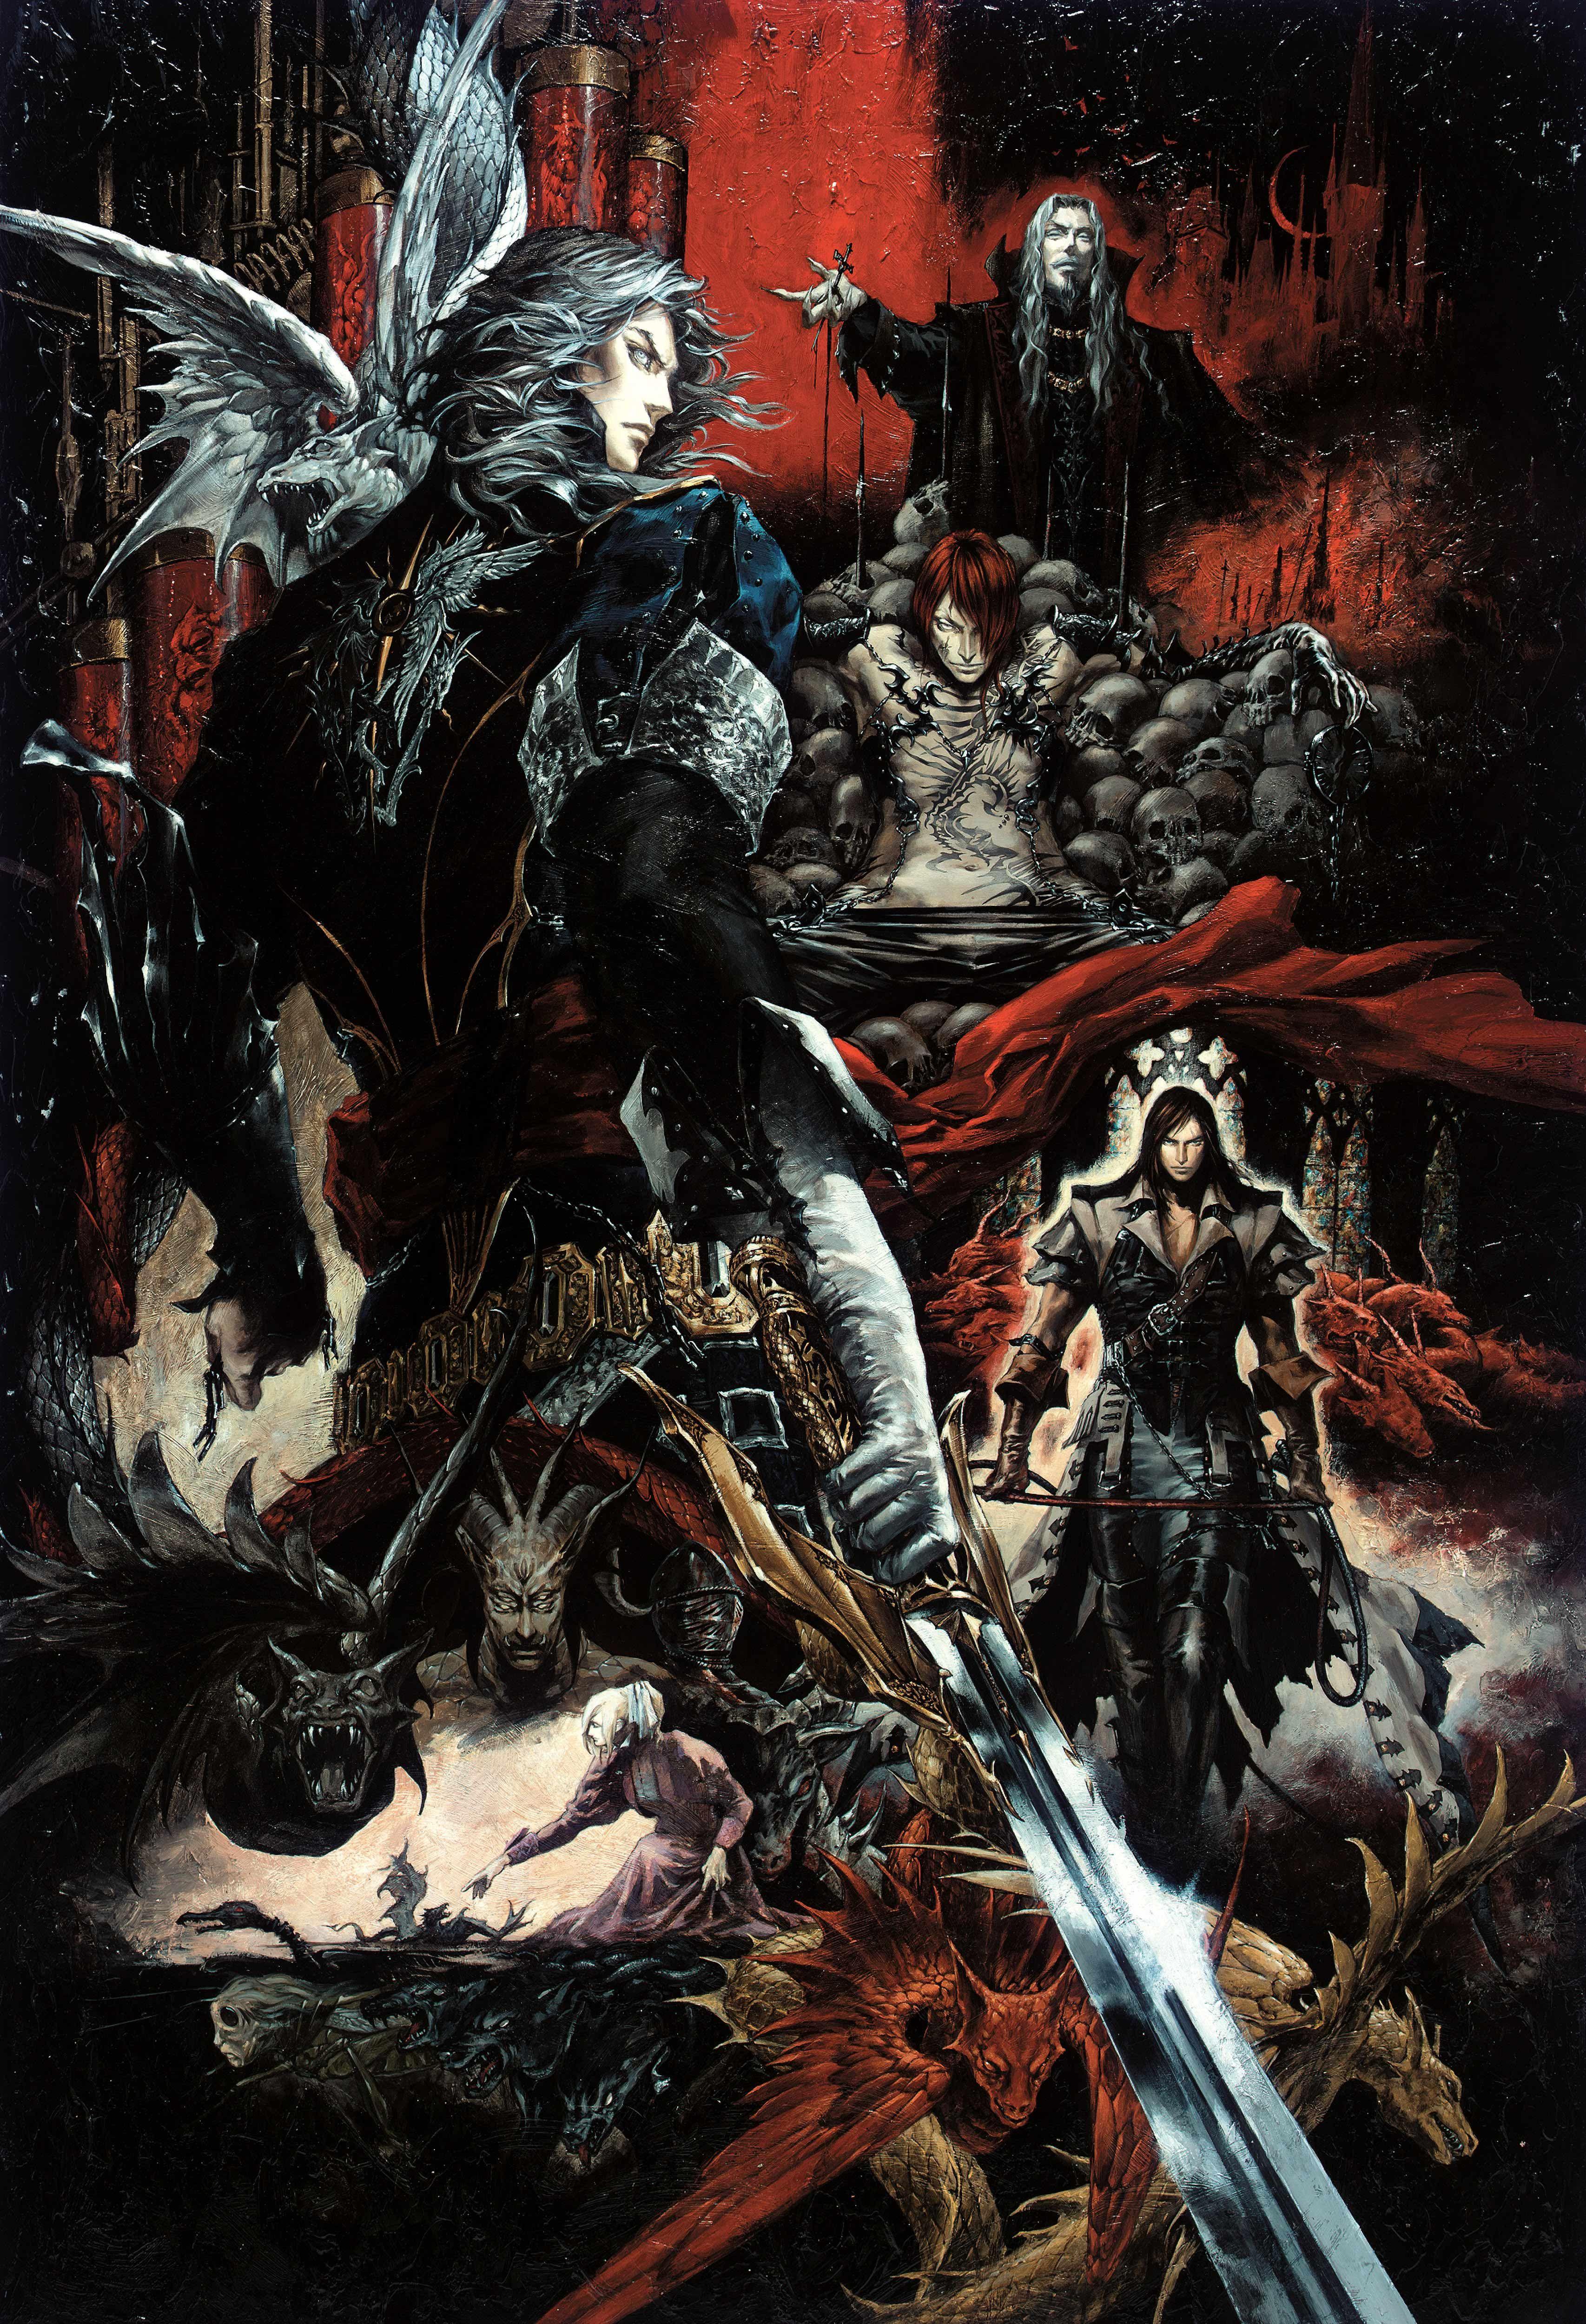 Fantastic Castlevania Art By Ayami Kojima Hector Dracula Julia